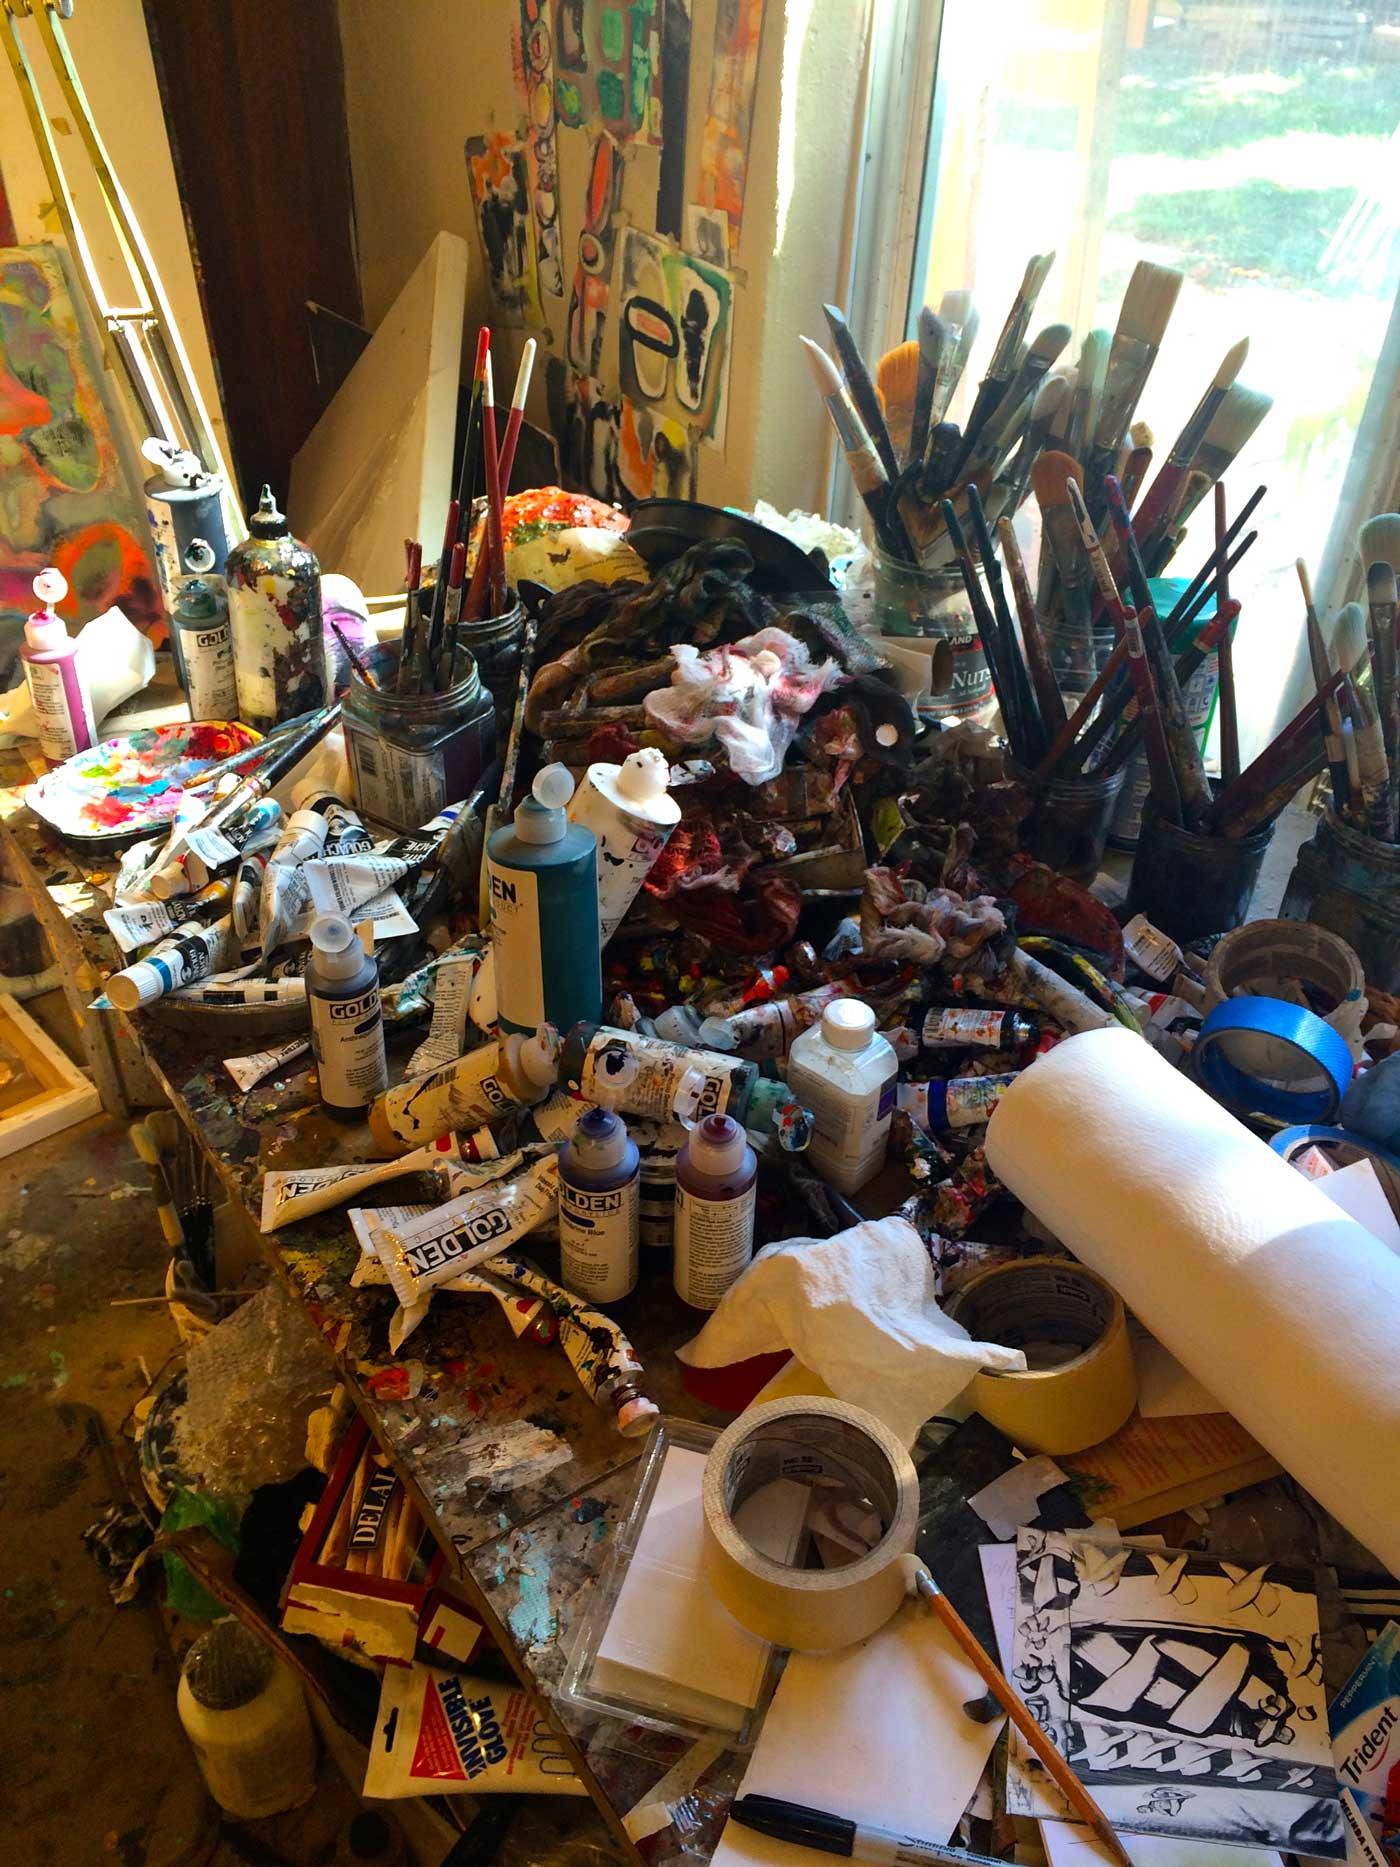 Work materials in the studio of the talented Melinda Myrow